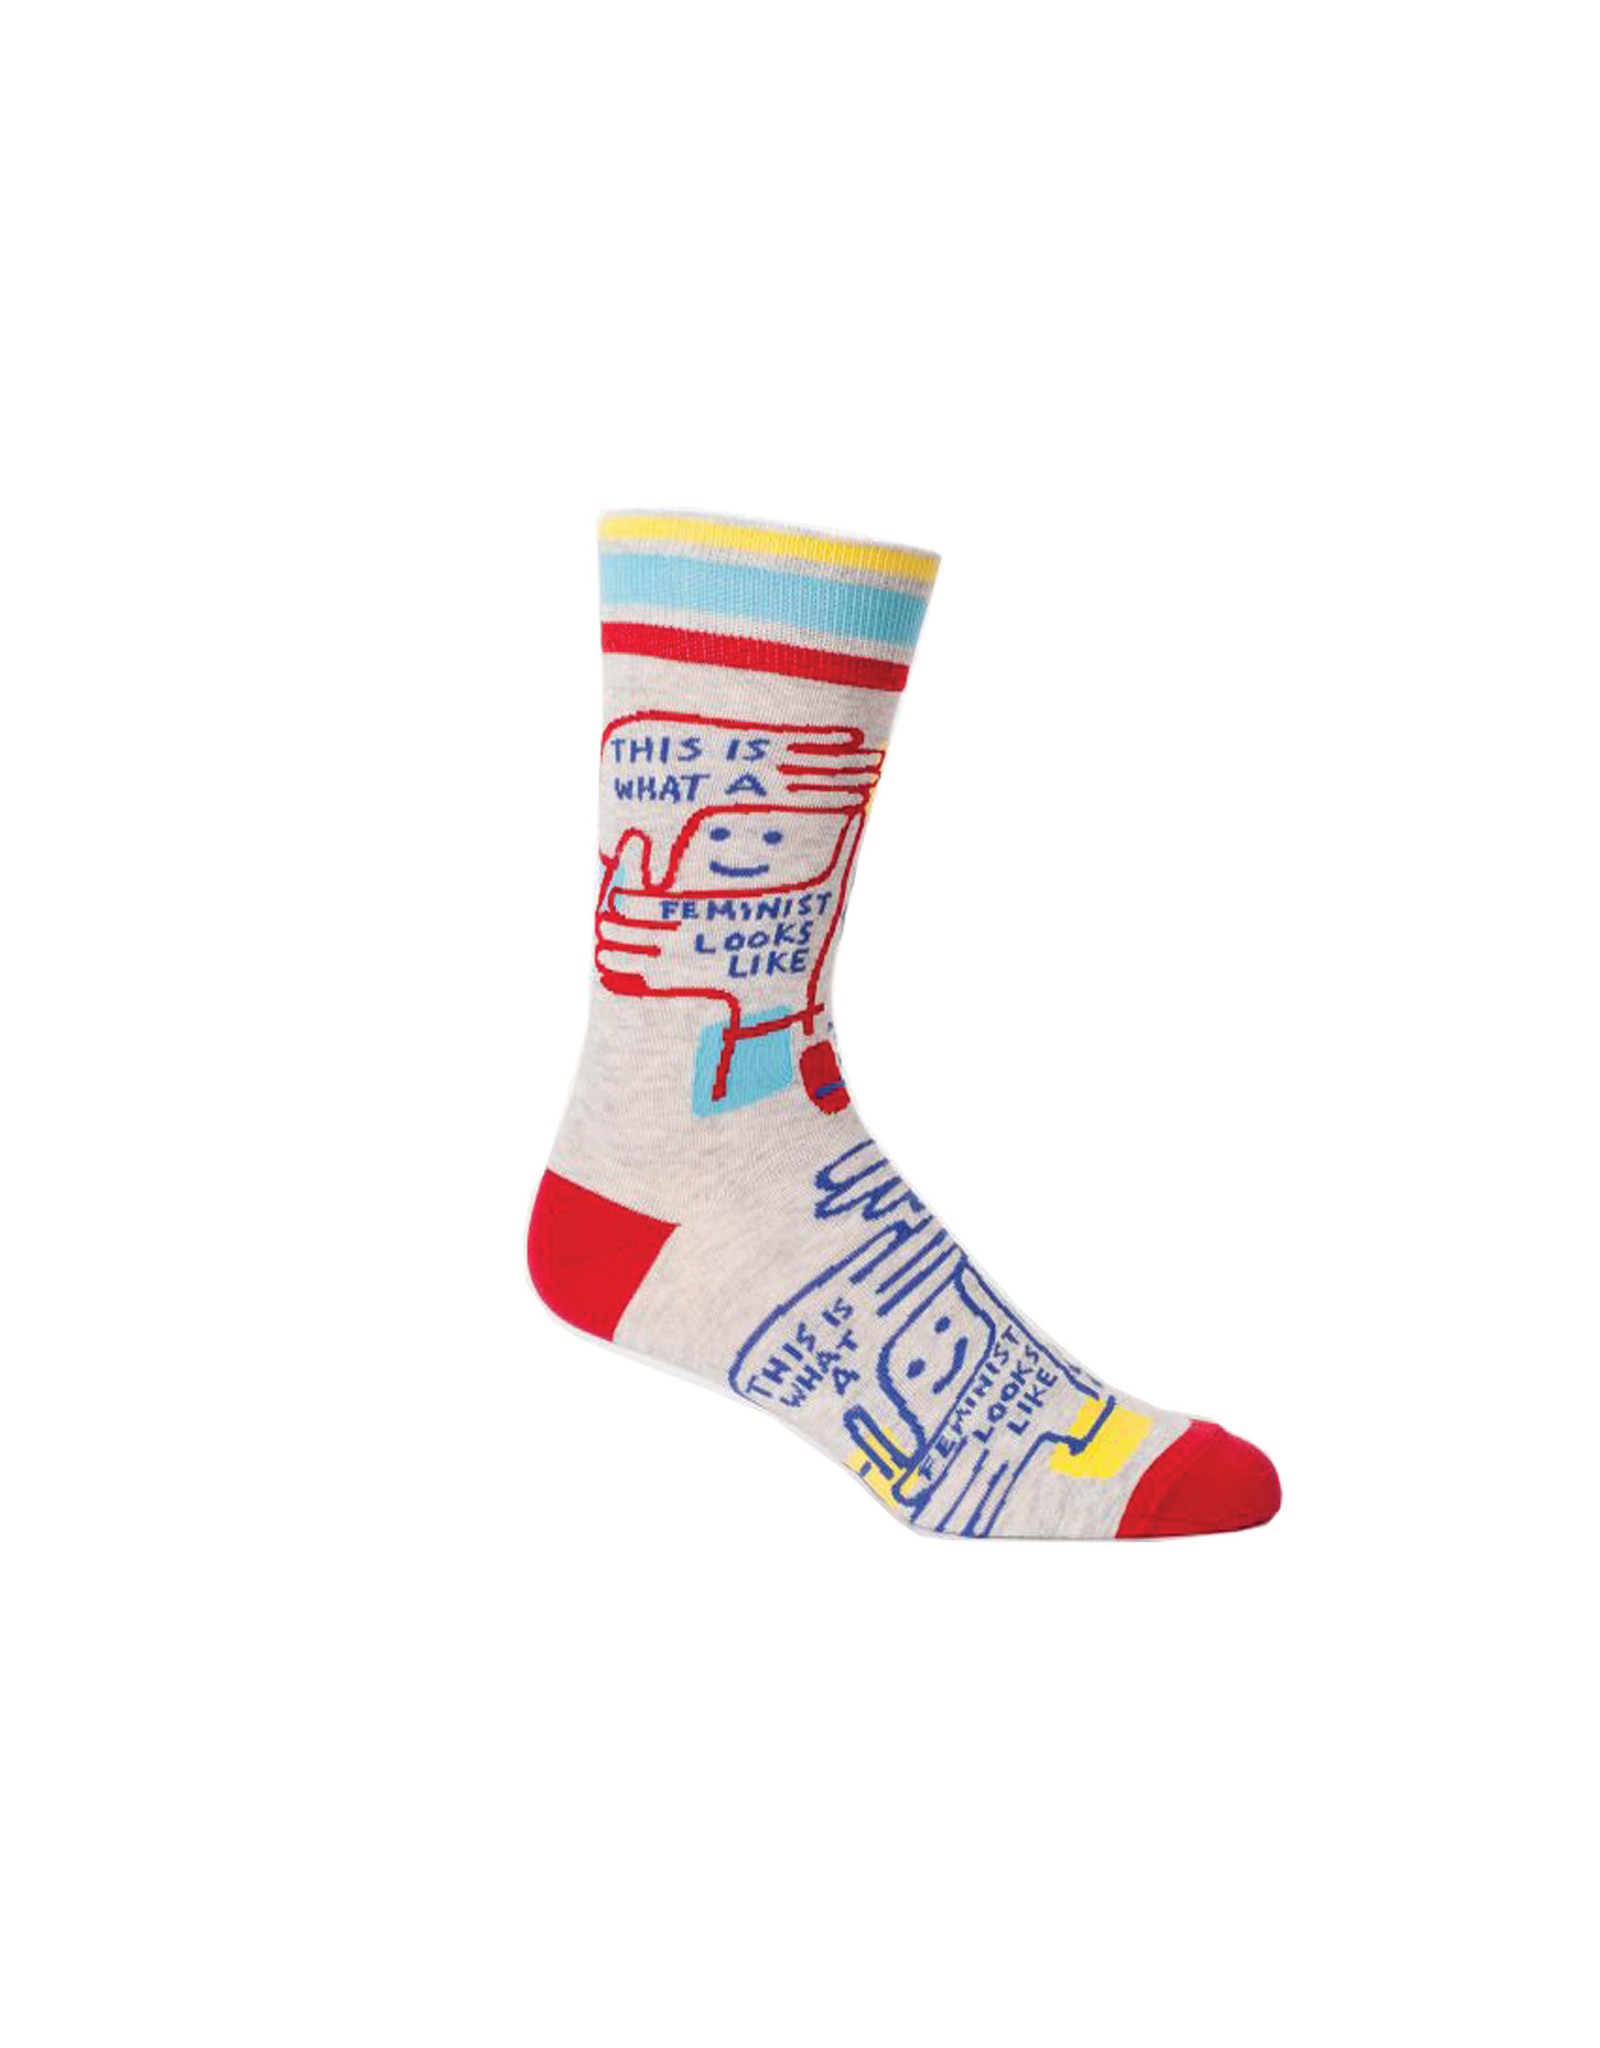 Blue Q Feminist Looks Like S-M Crew Socks